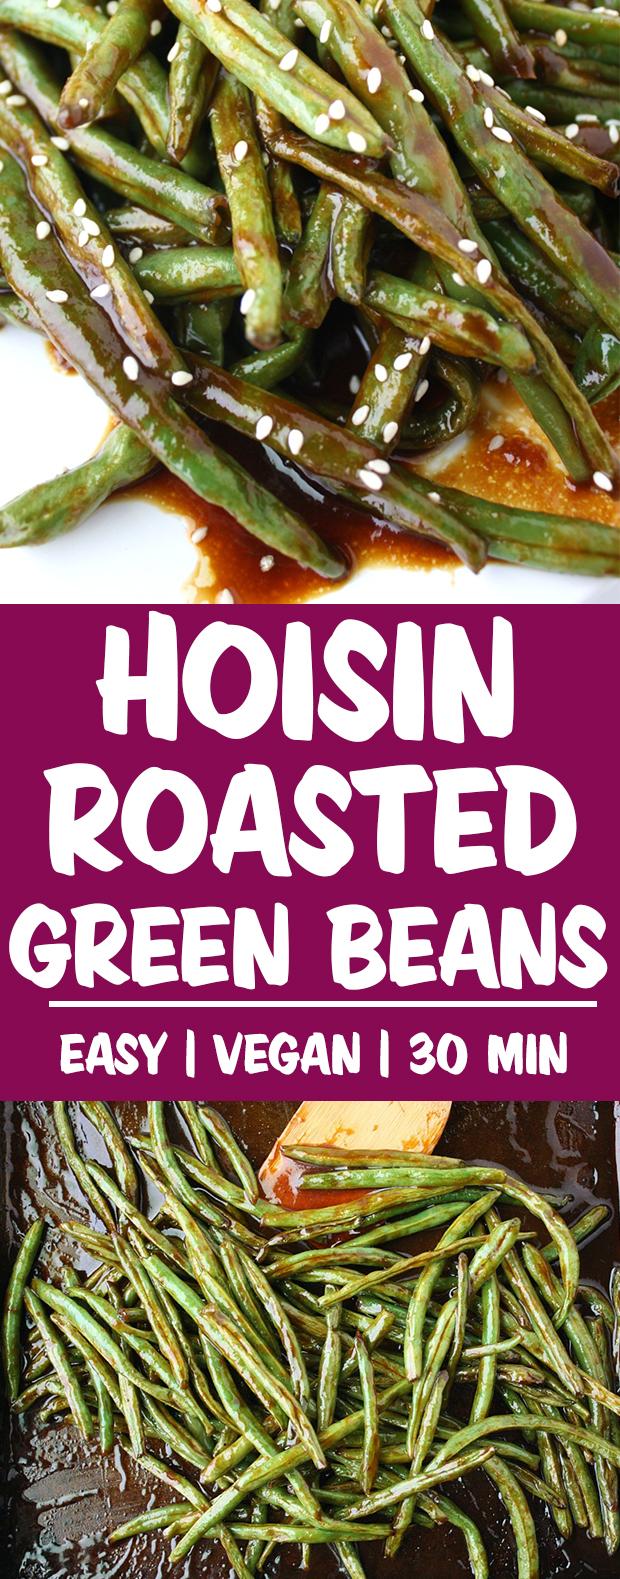 Vegan hoisin roasted green beans photo collage